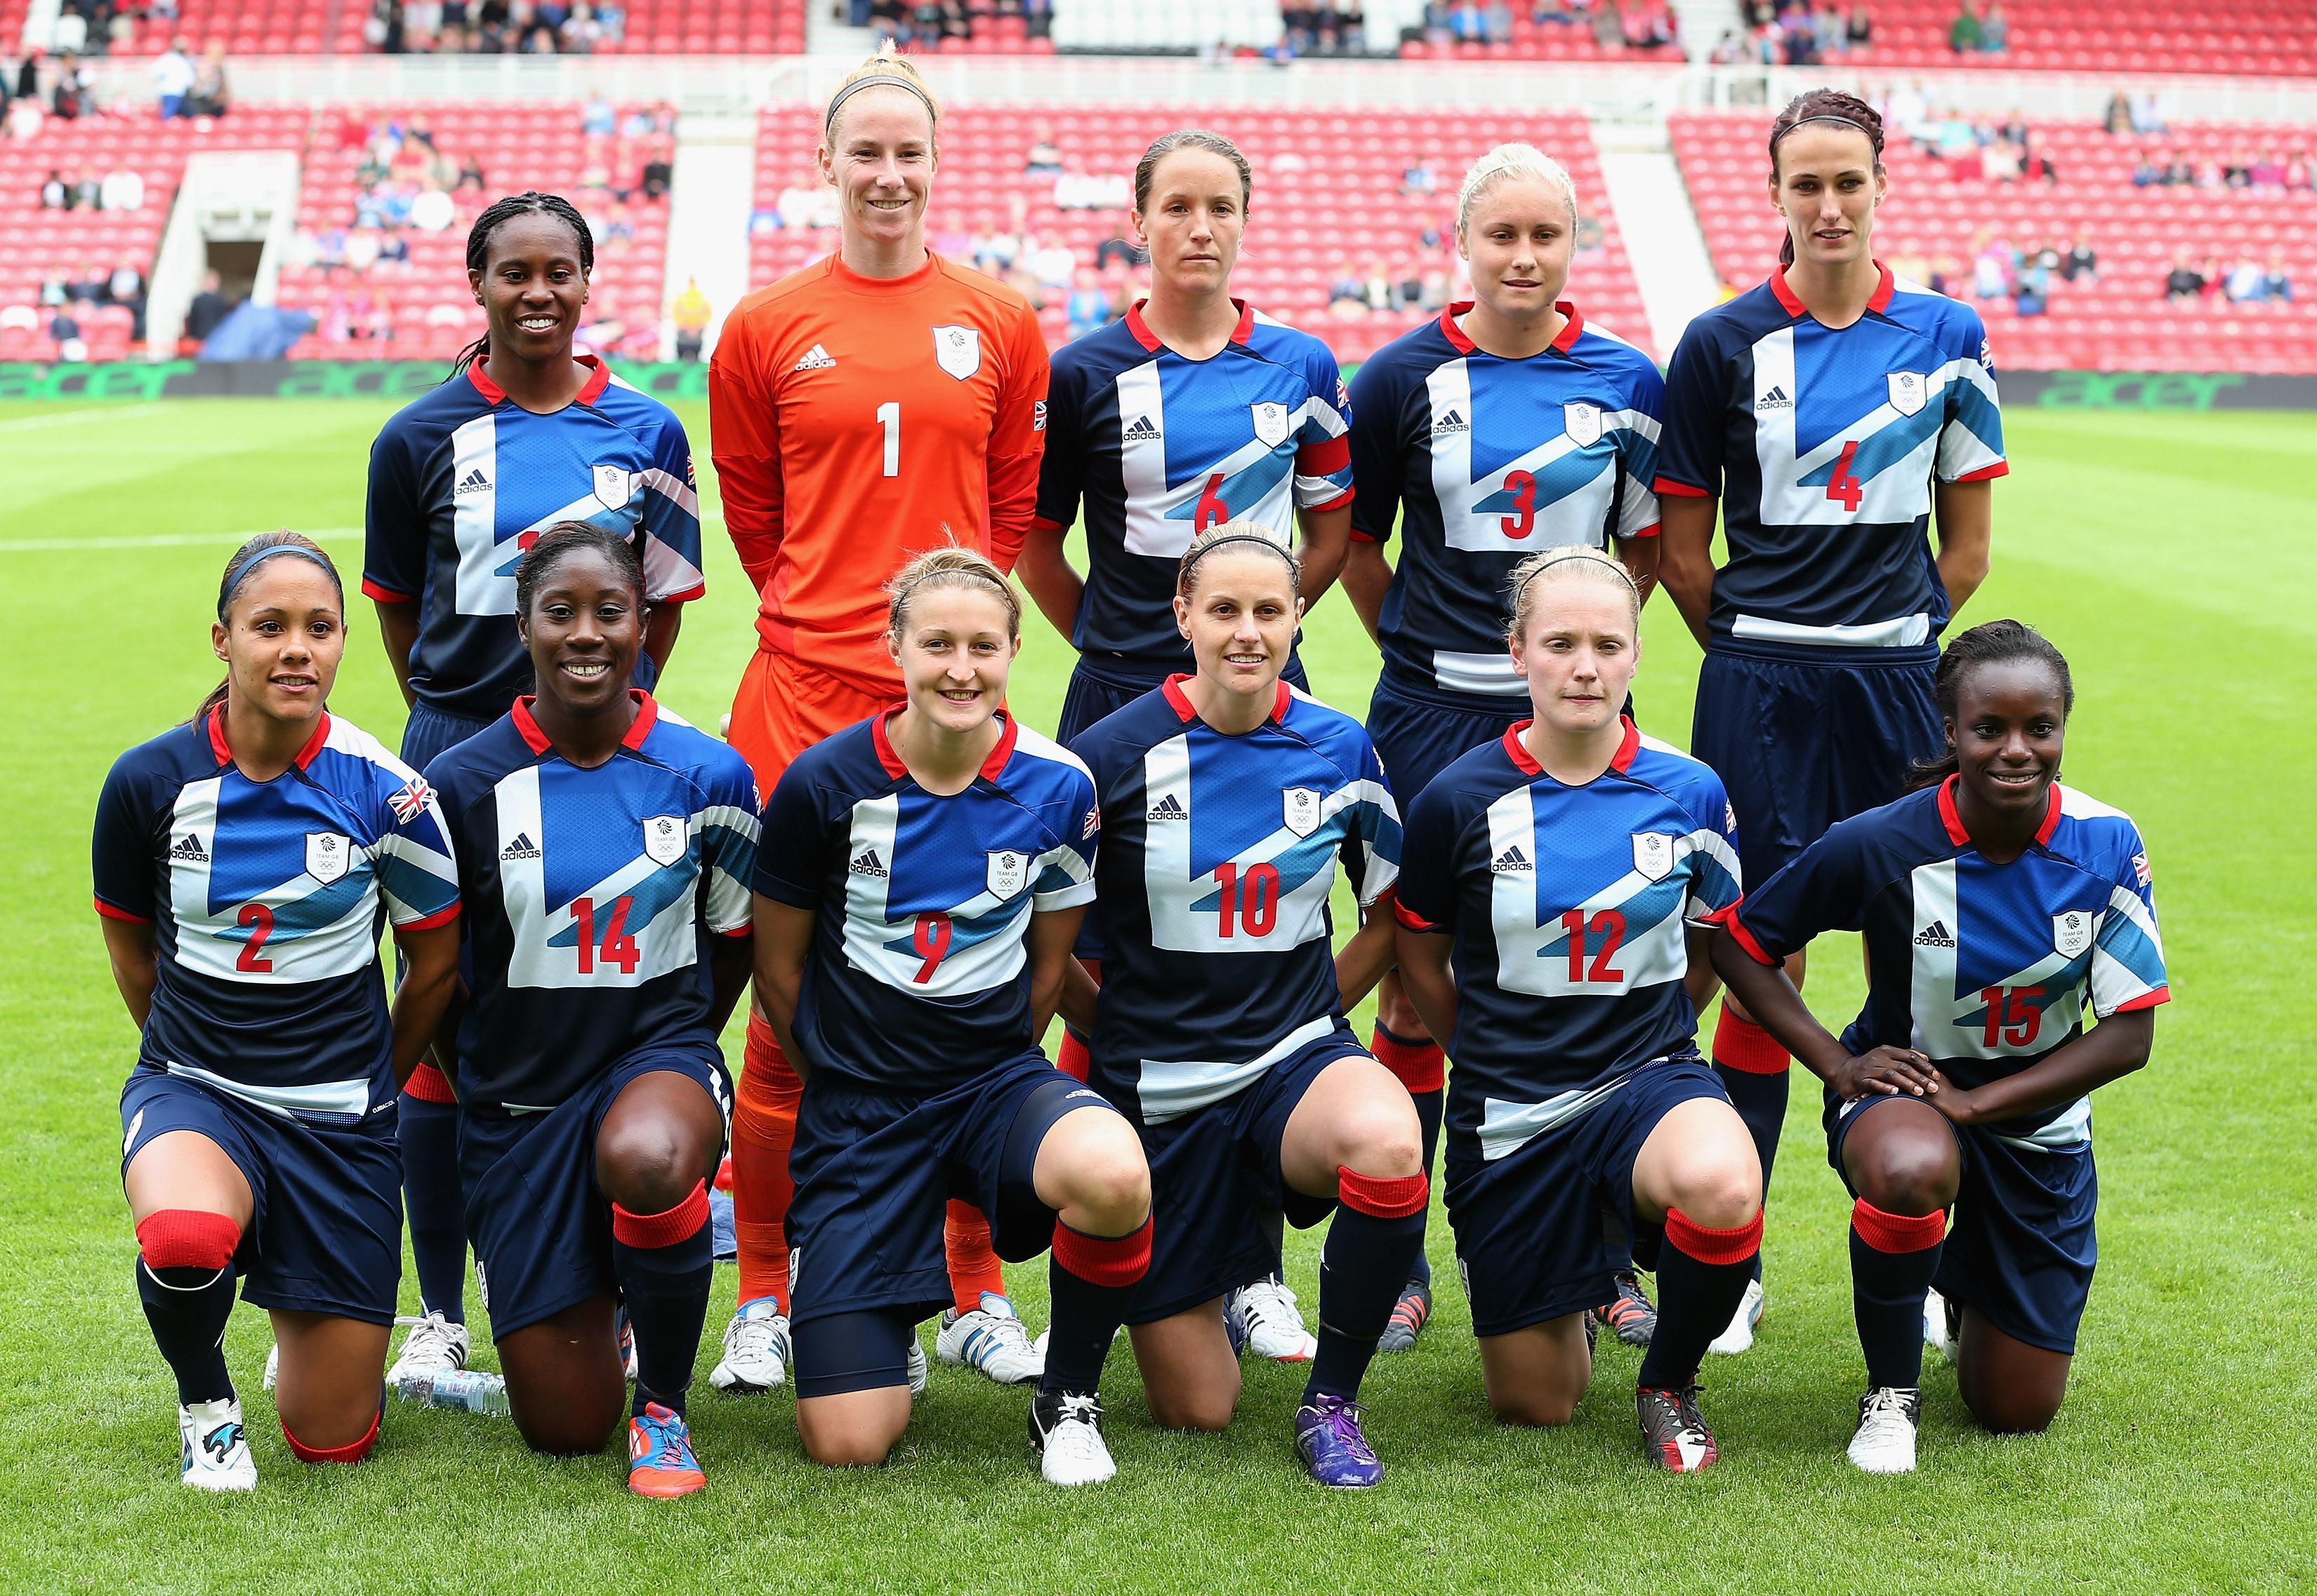 Houghton's pride for Team GB's City centre